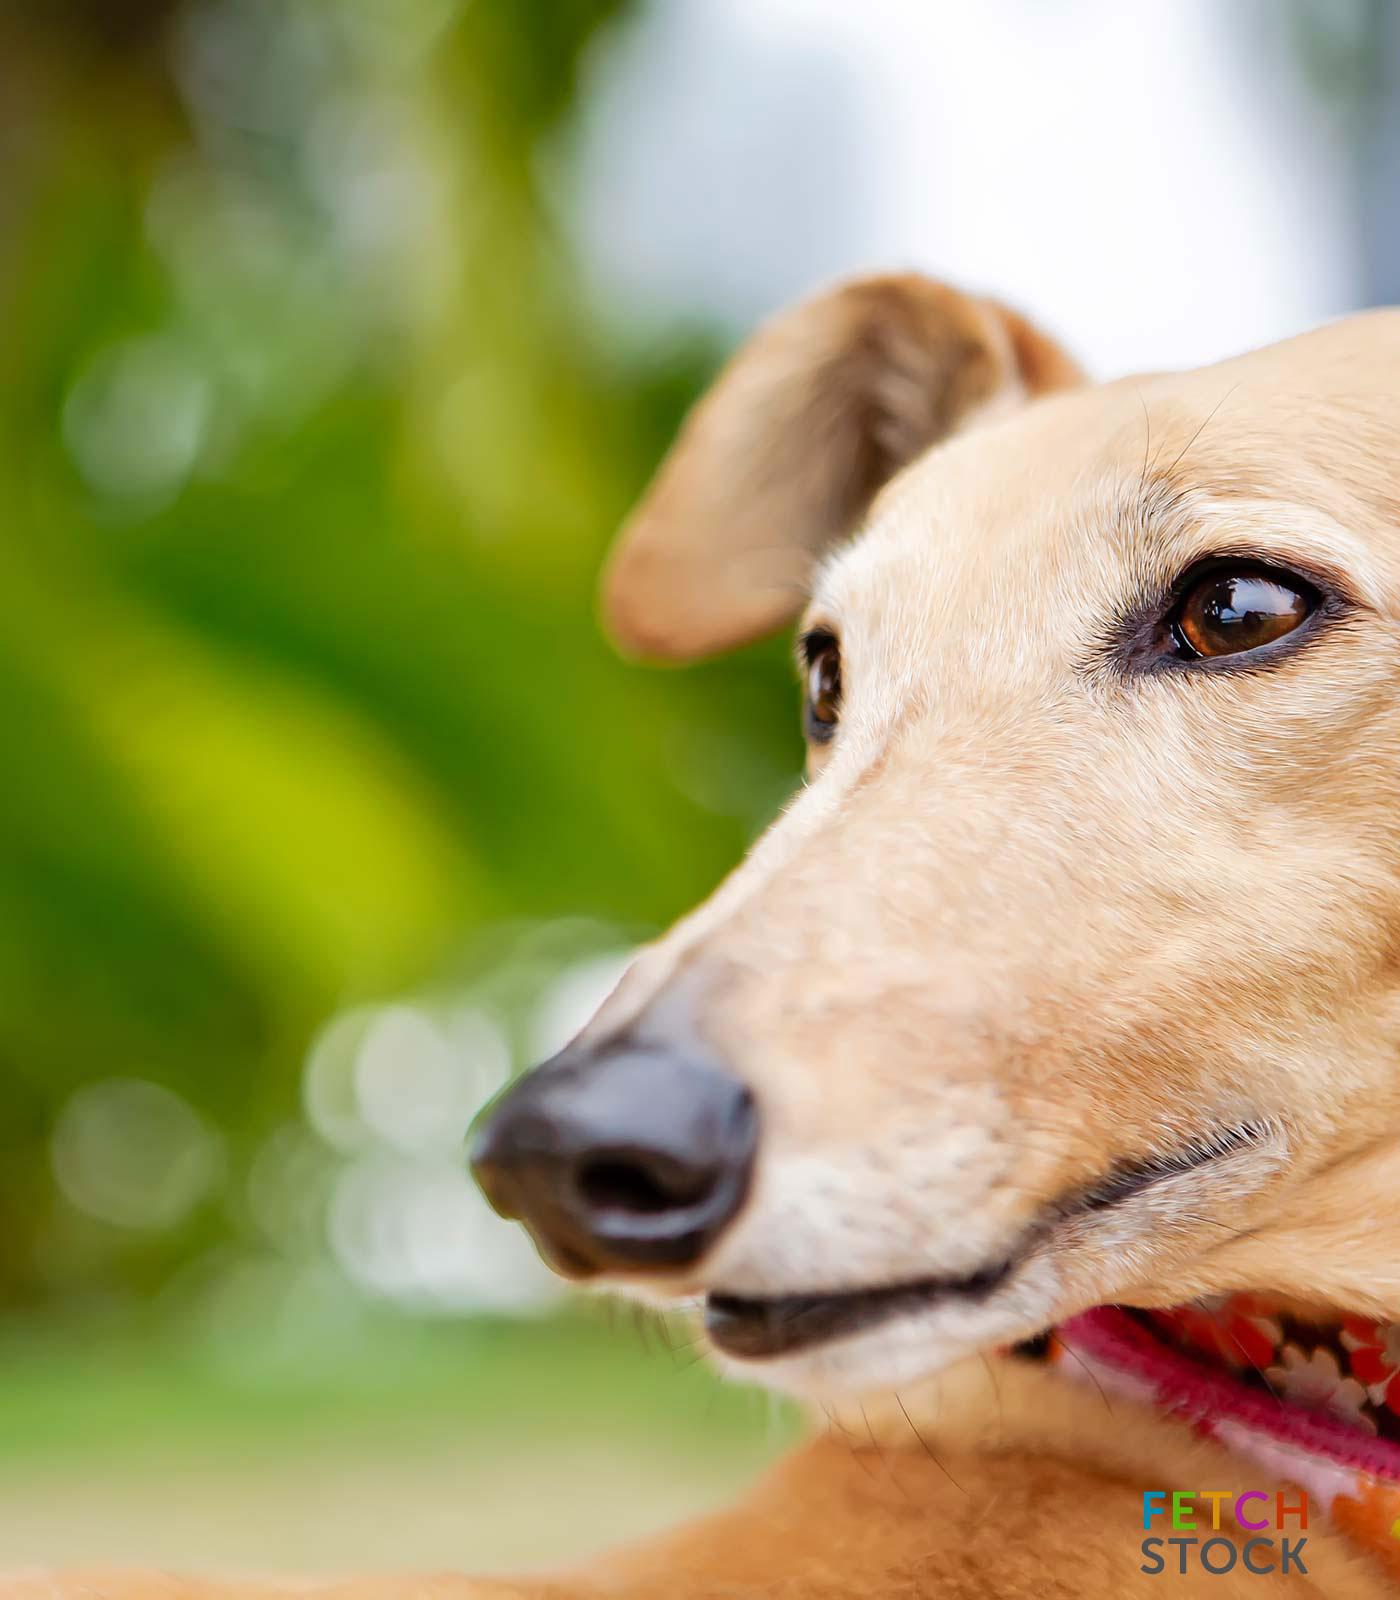 Fetch Stock Stock Greyhound Dog Photo